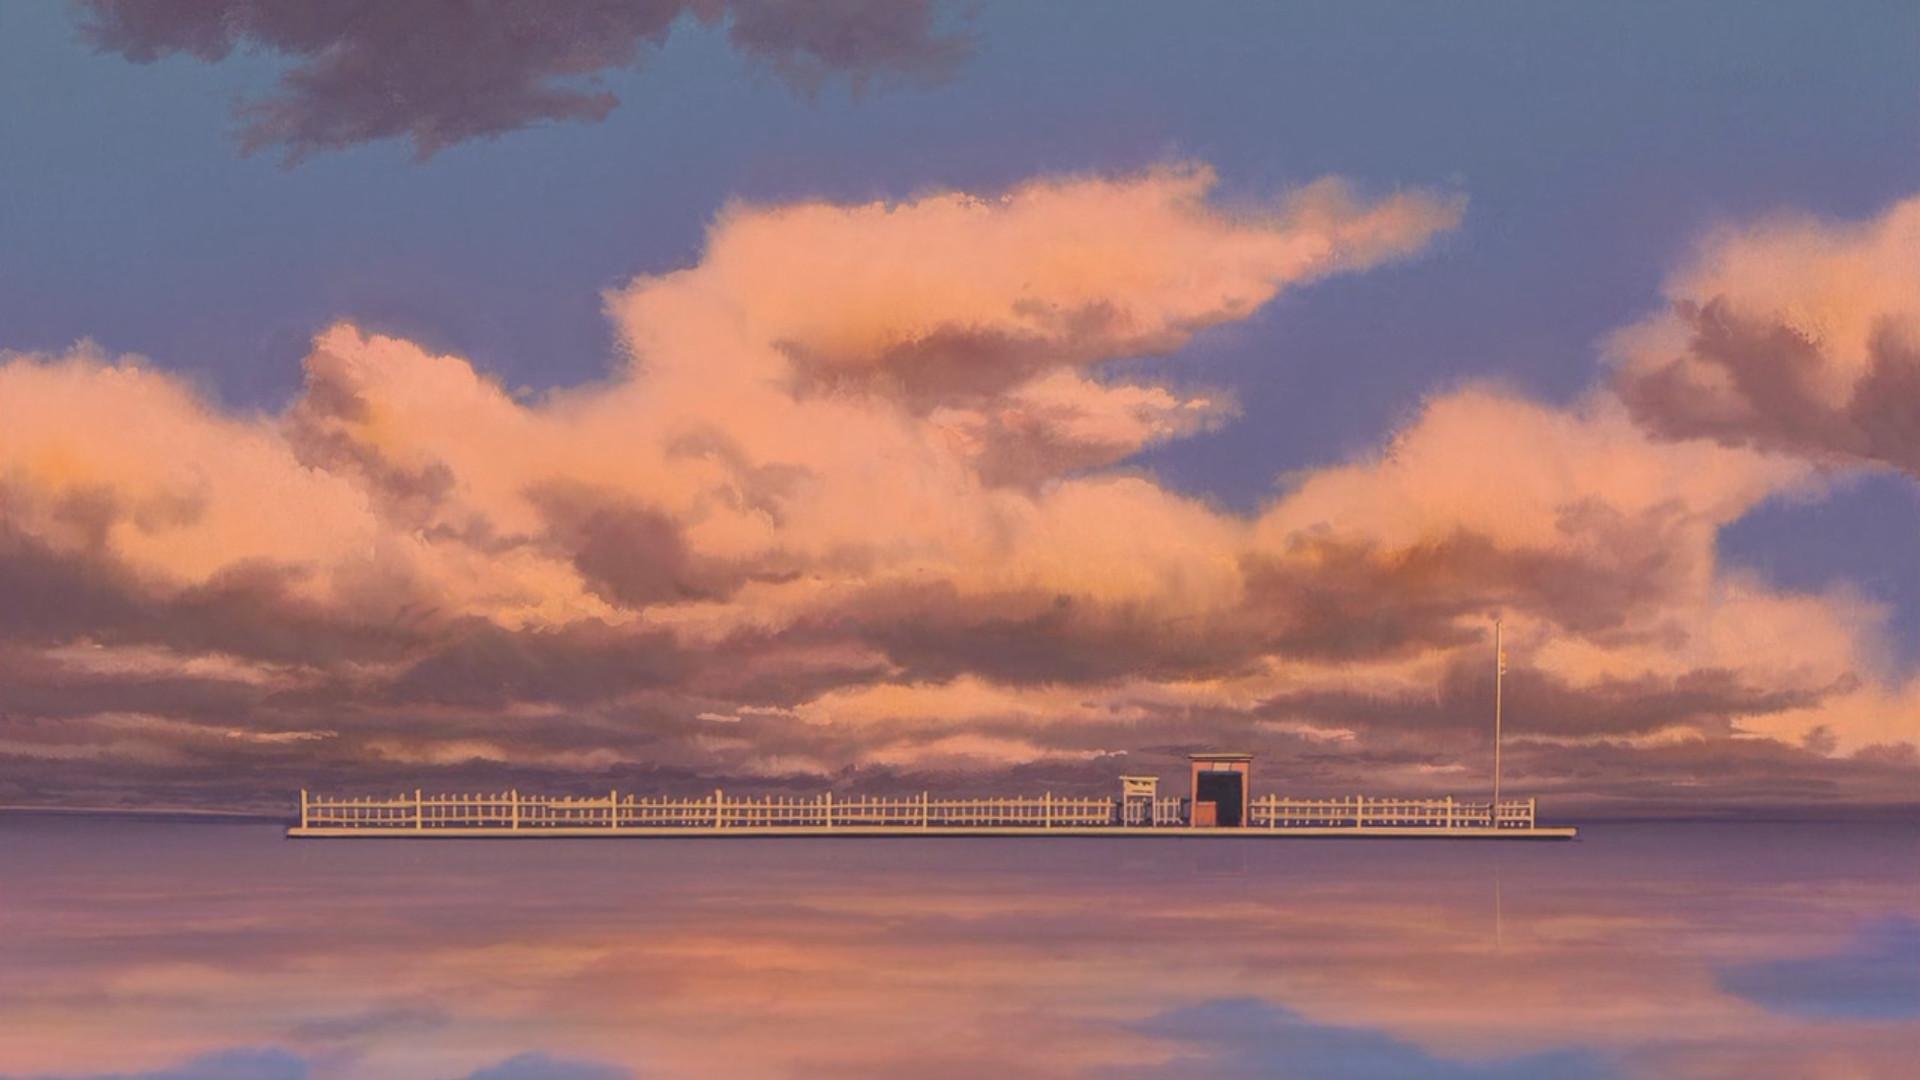 The Sixth Station, Miyazaki's Spirited Away